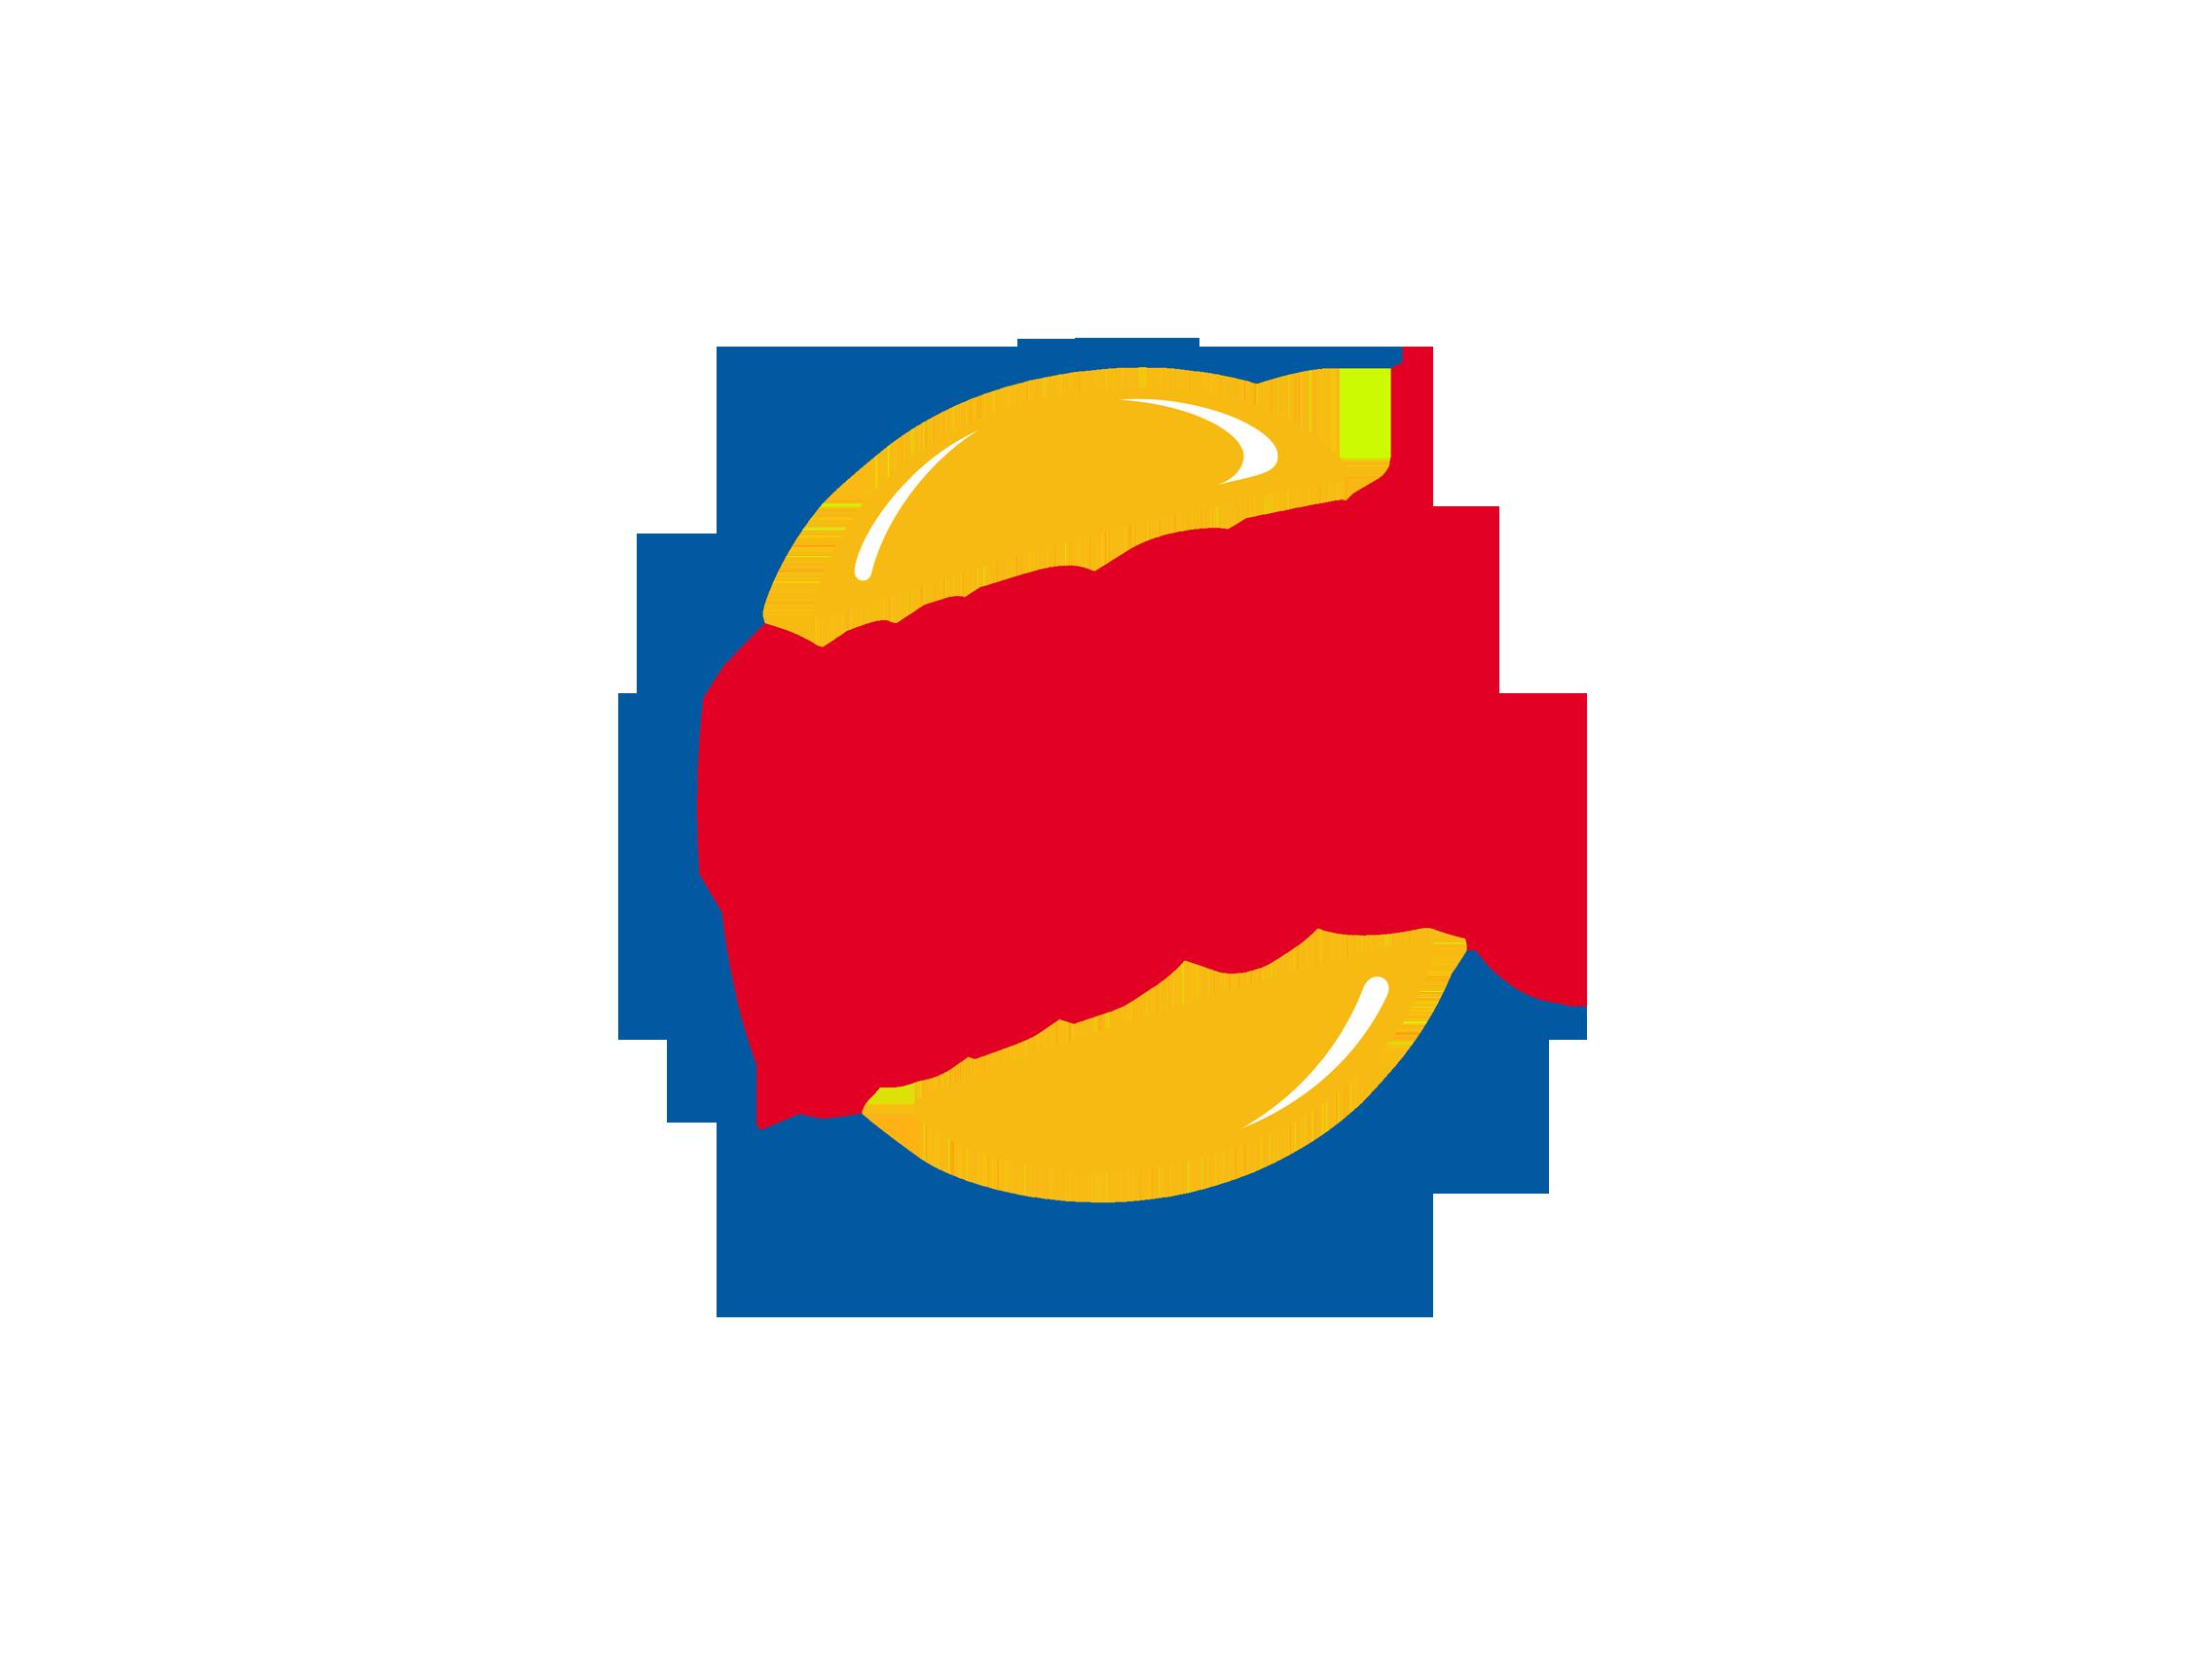 burger-king-png-logo-0.png